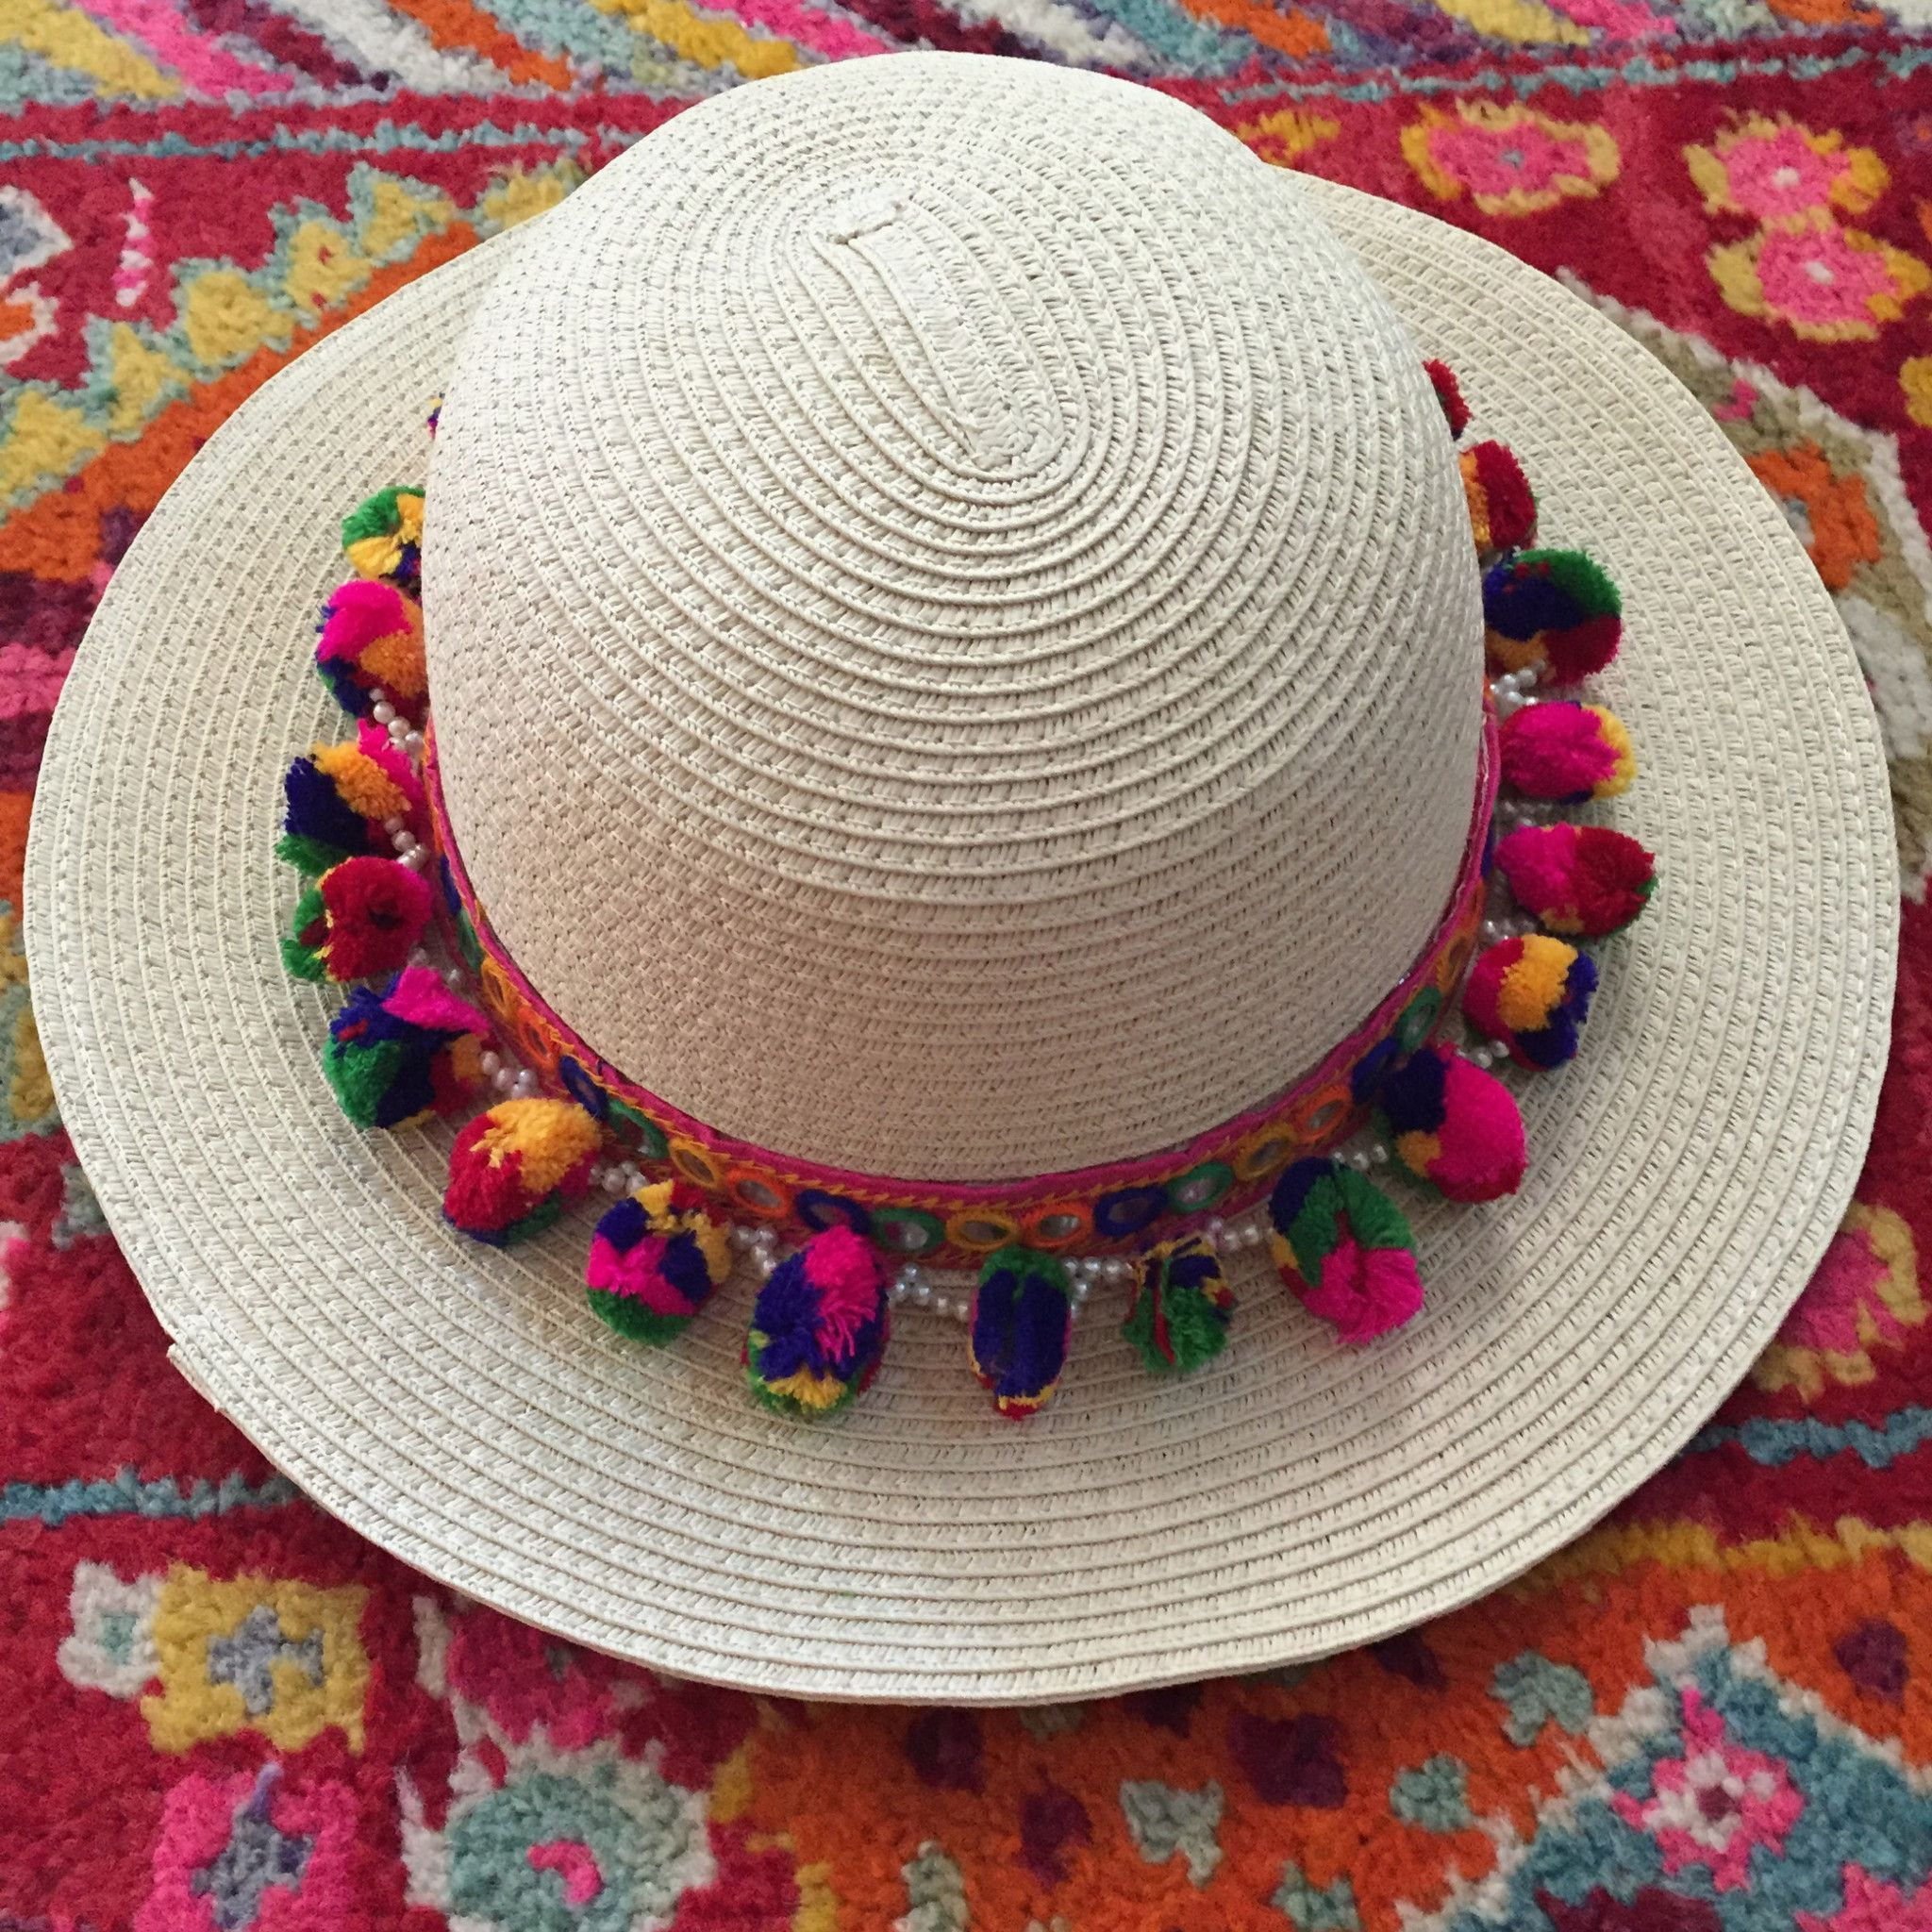 Multicolored Boho Pom Pom Sun Hat Accesorios Con Pompones bb0c9131fc24